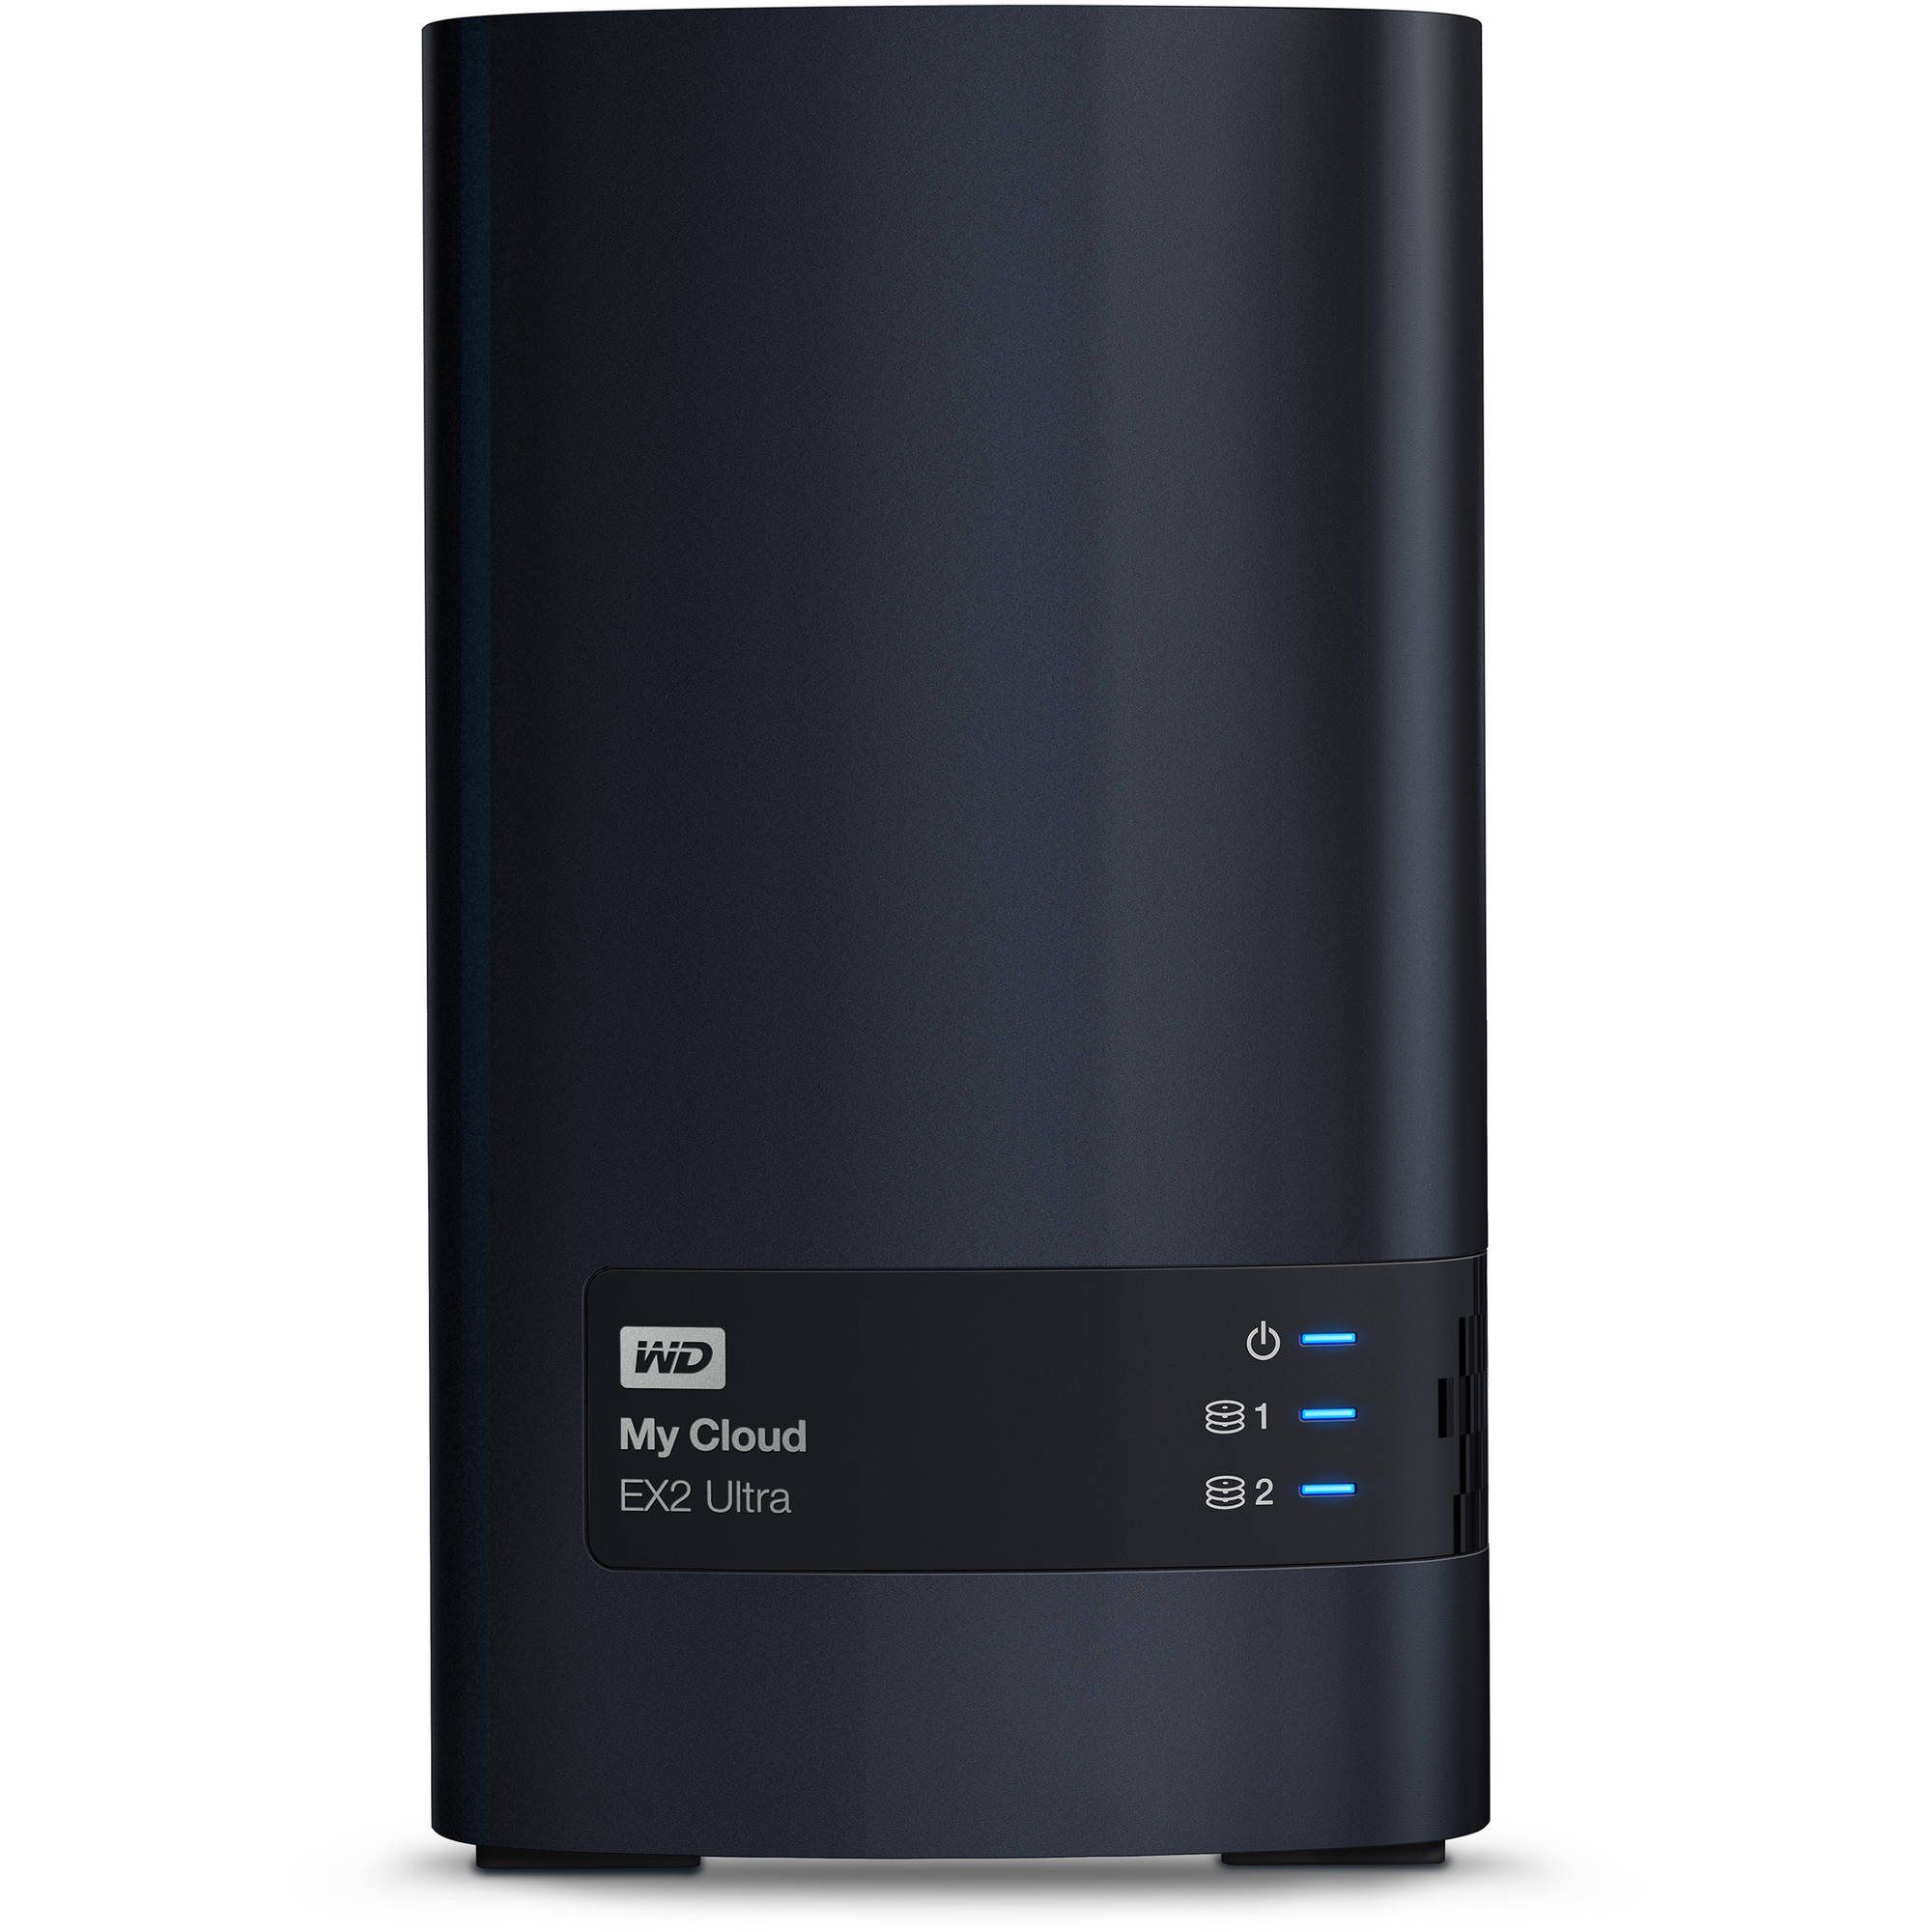 WD My Cloud EX2 Ultra 2-Bay Personal Cloud Storage Server (Diskless)